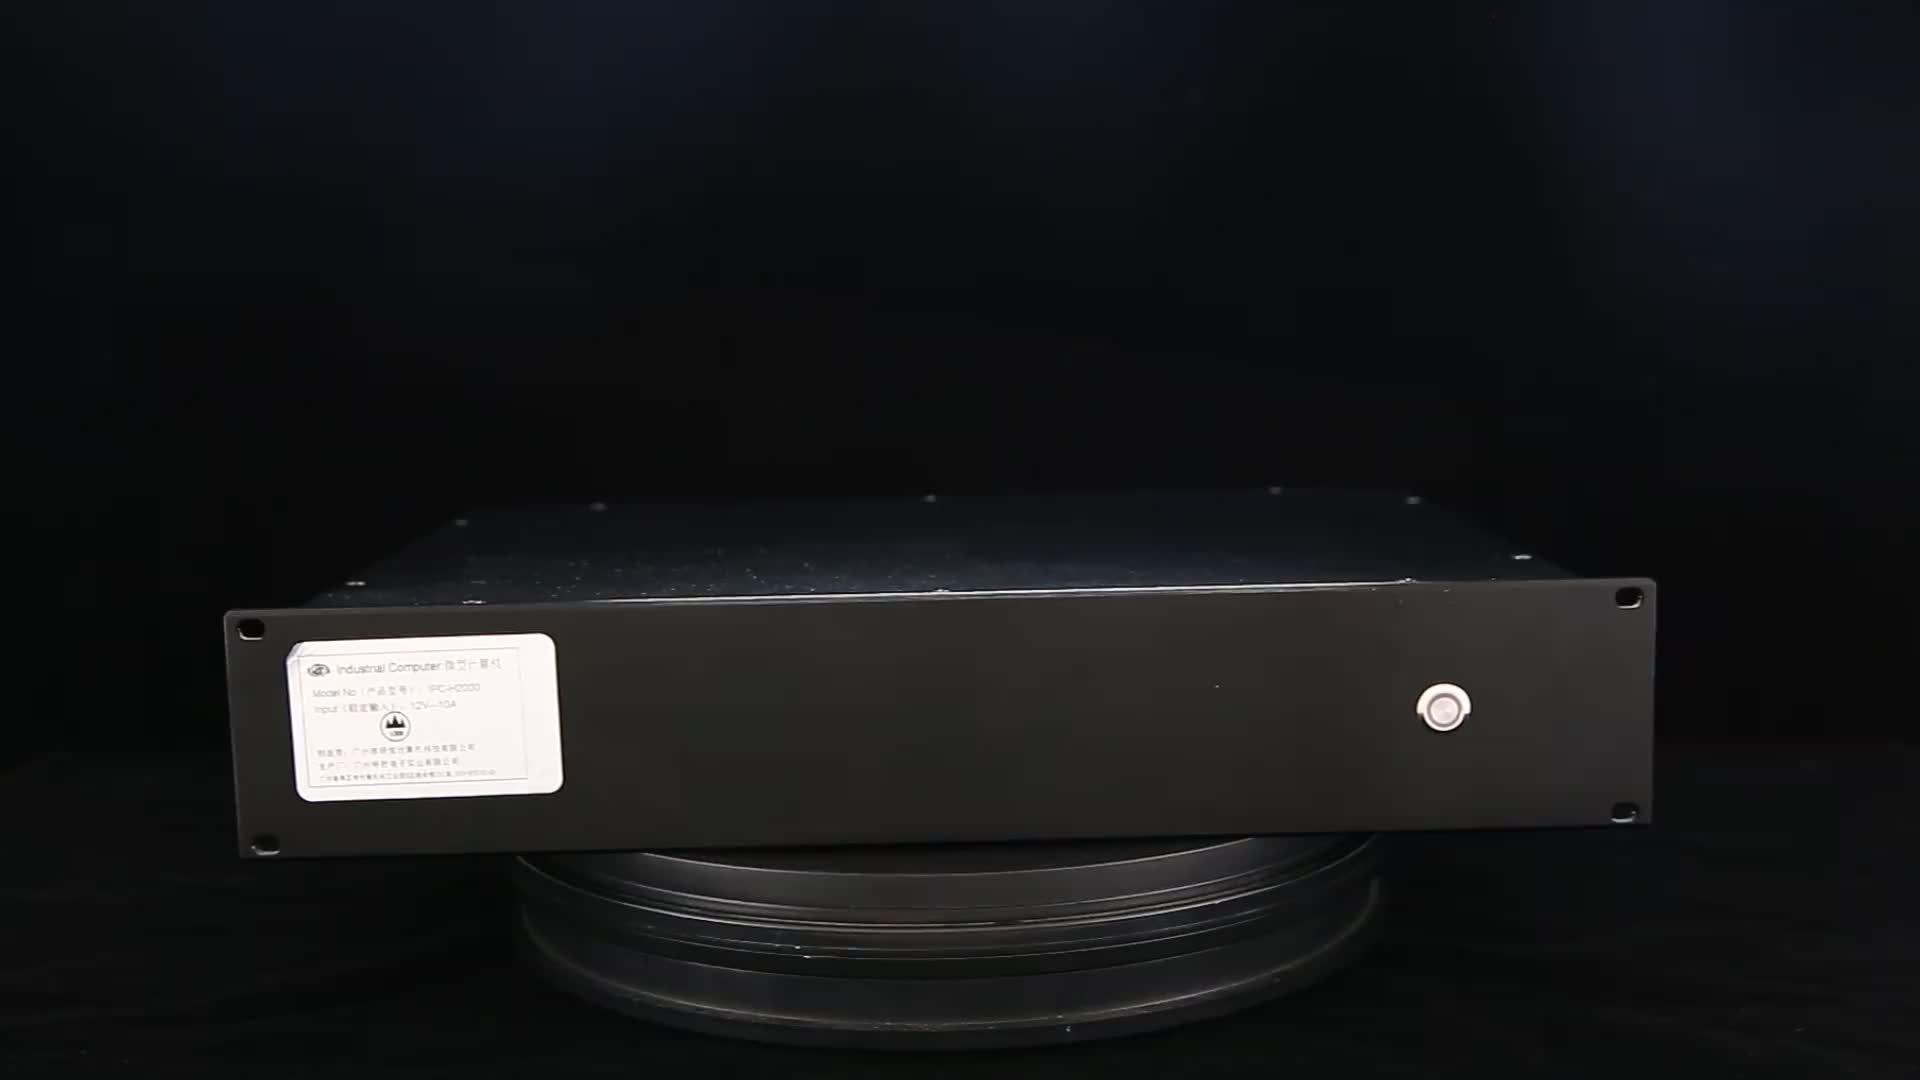 2U iptv サーバビデオ編集 skylake インテル 6th コア i3 6100u 産業 x86 組み込み pc linux ミニサーバ